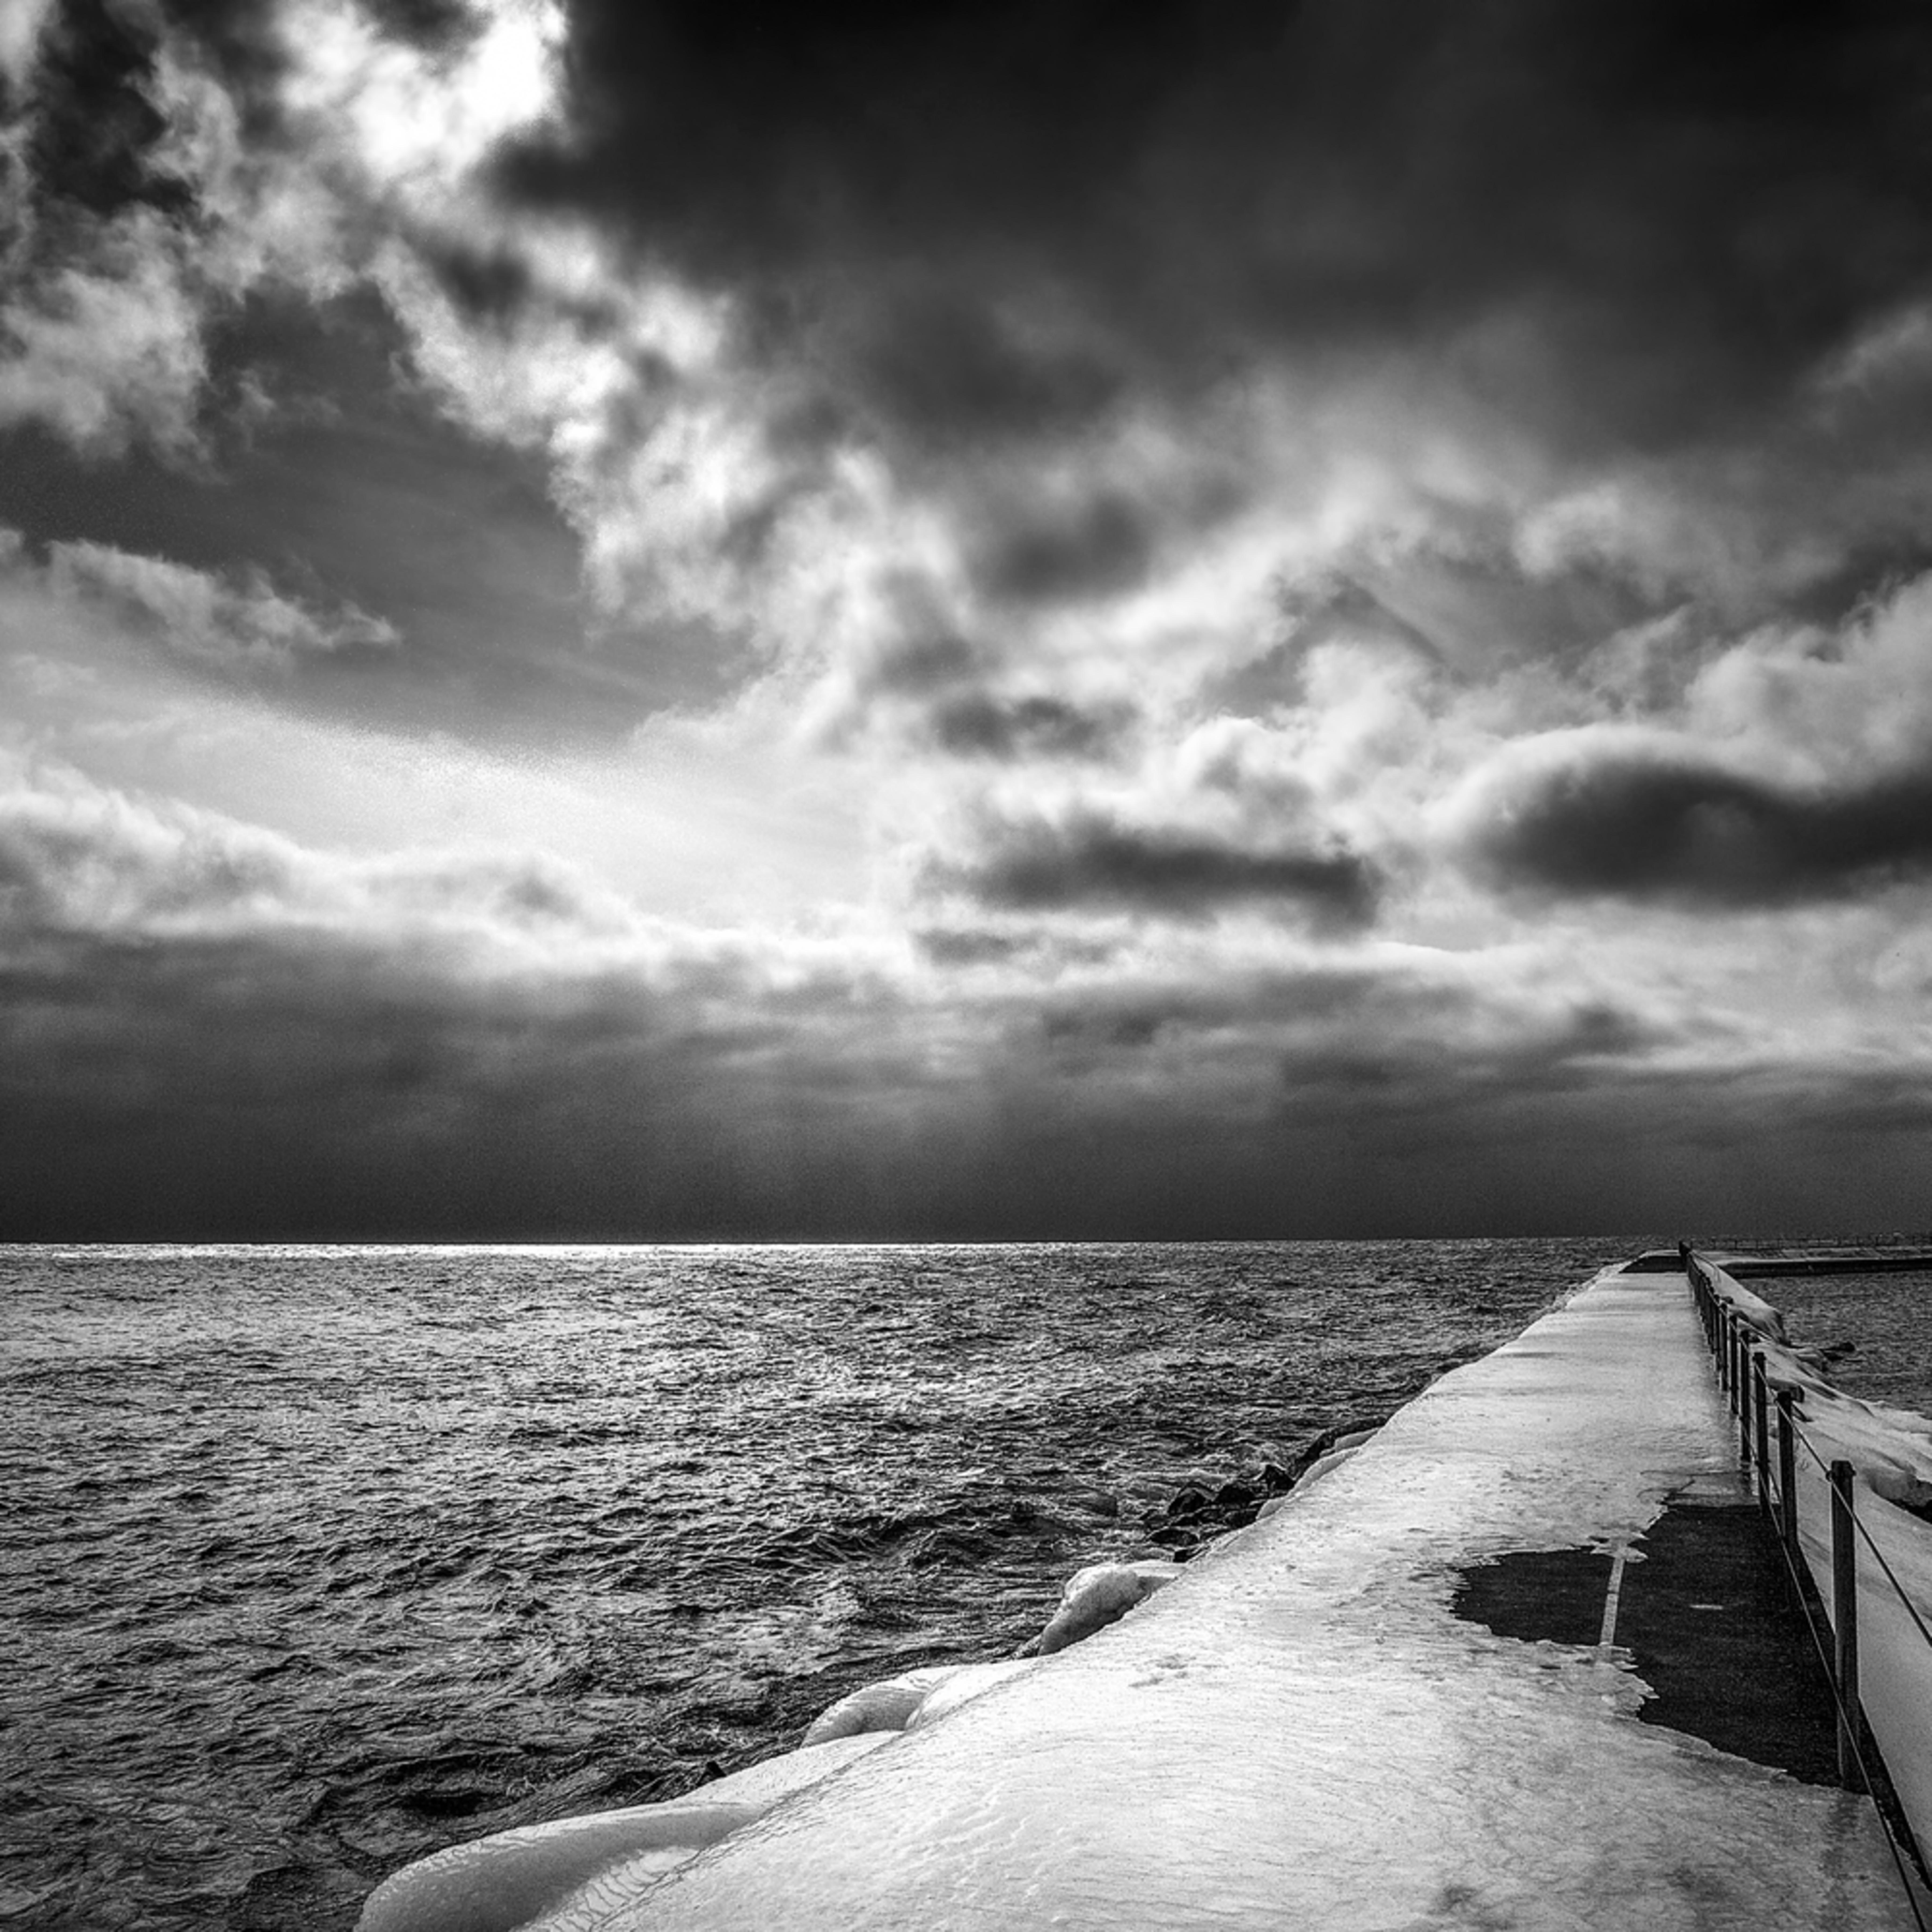 Lake superior ice walk ue0cfg